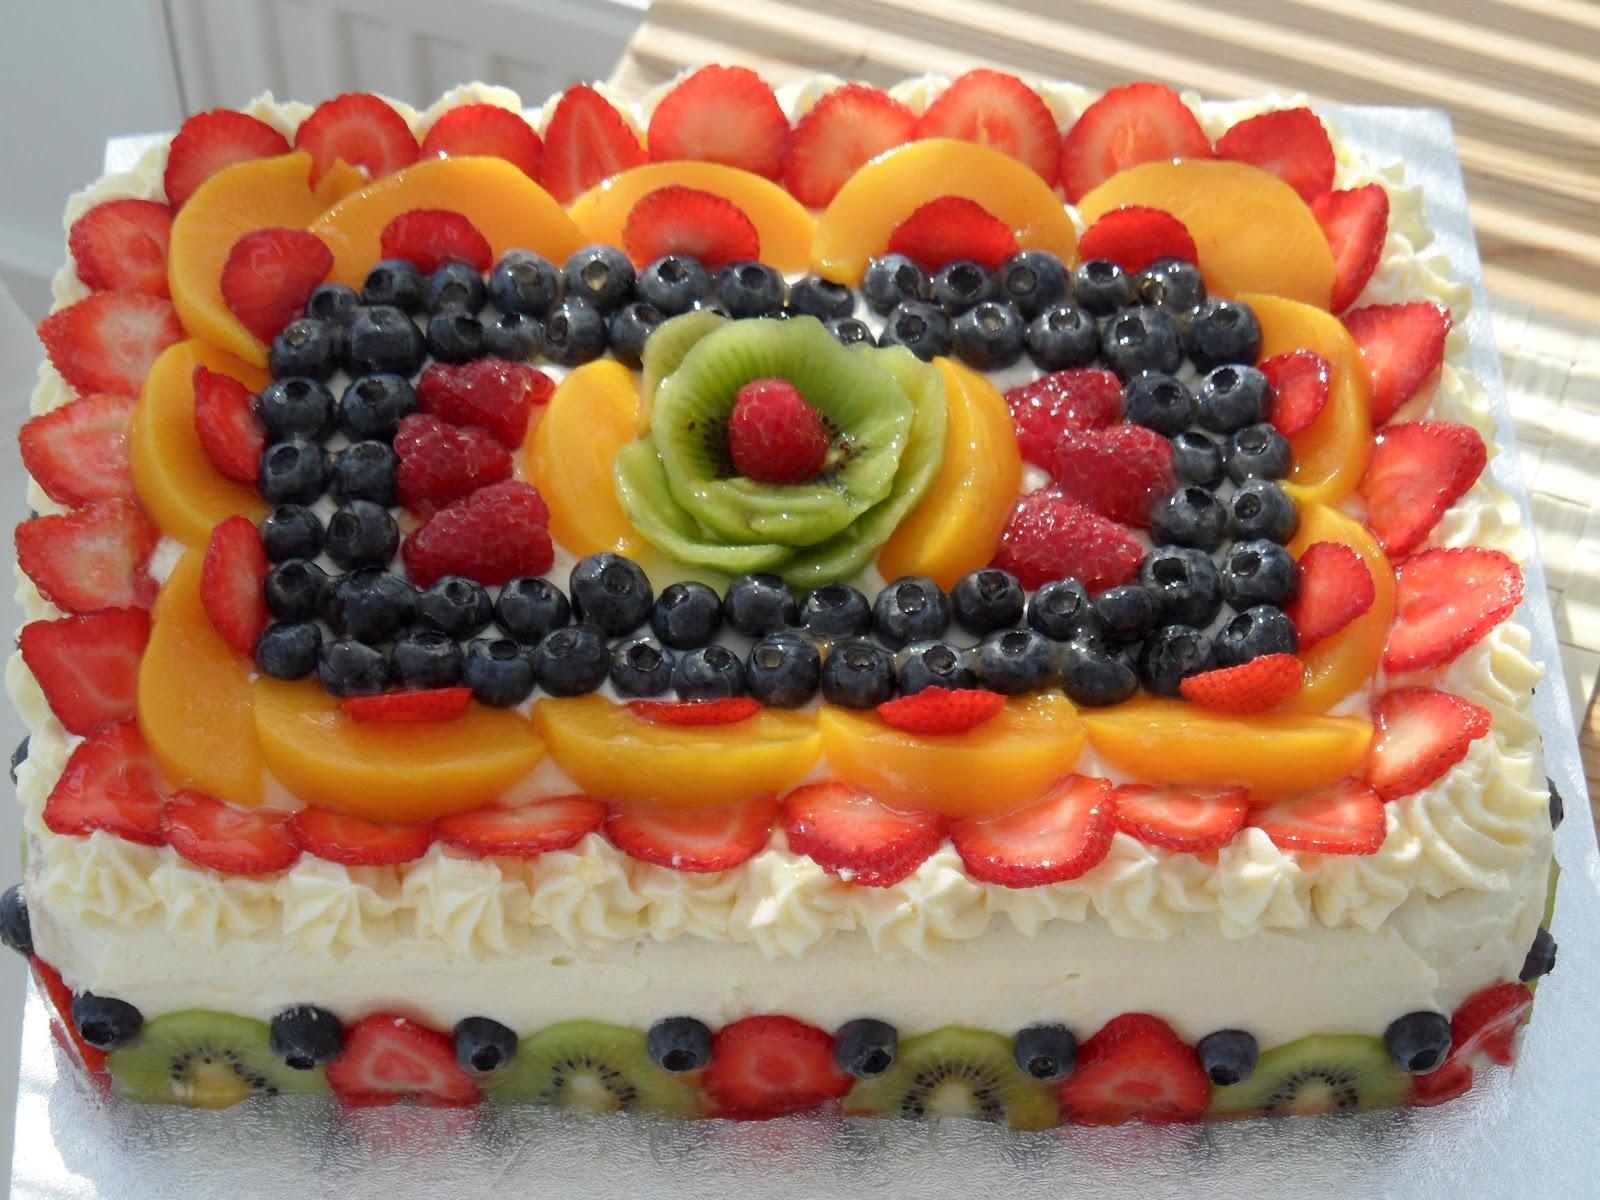 fruits food and cake - photo #41